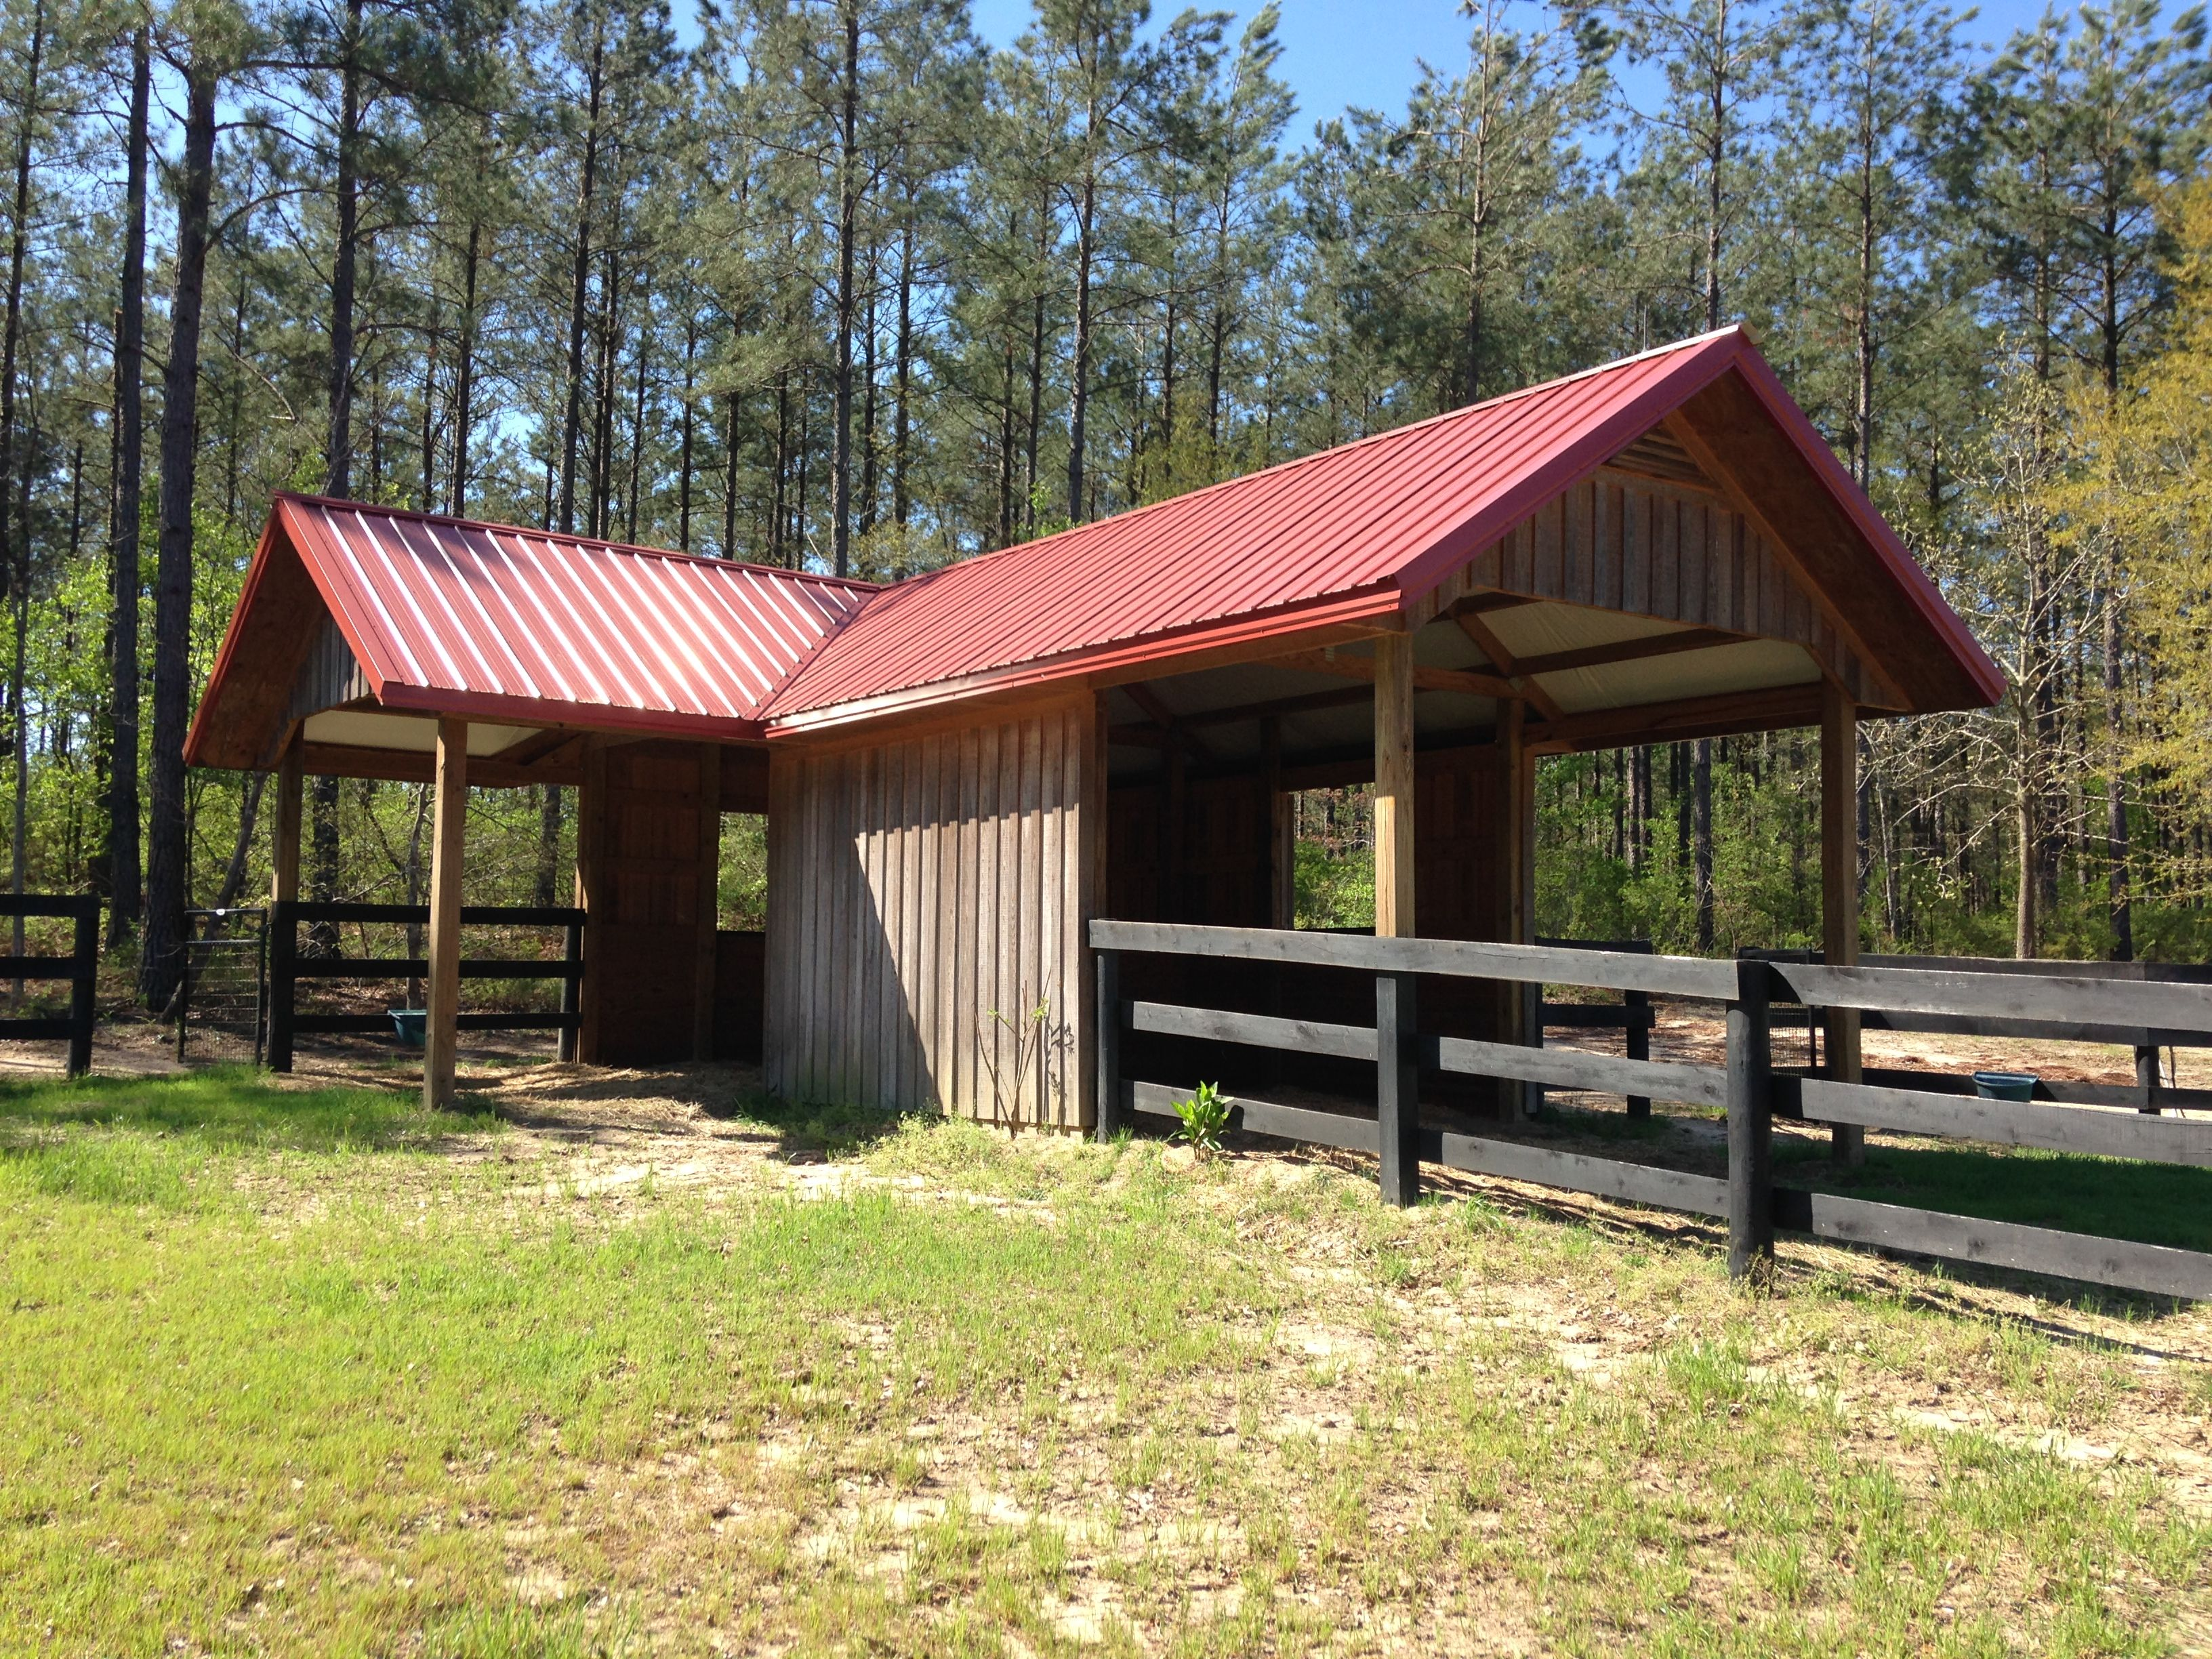 Run In Sheds And Barns : Run in shed elitebarns barns pinterest barn horse